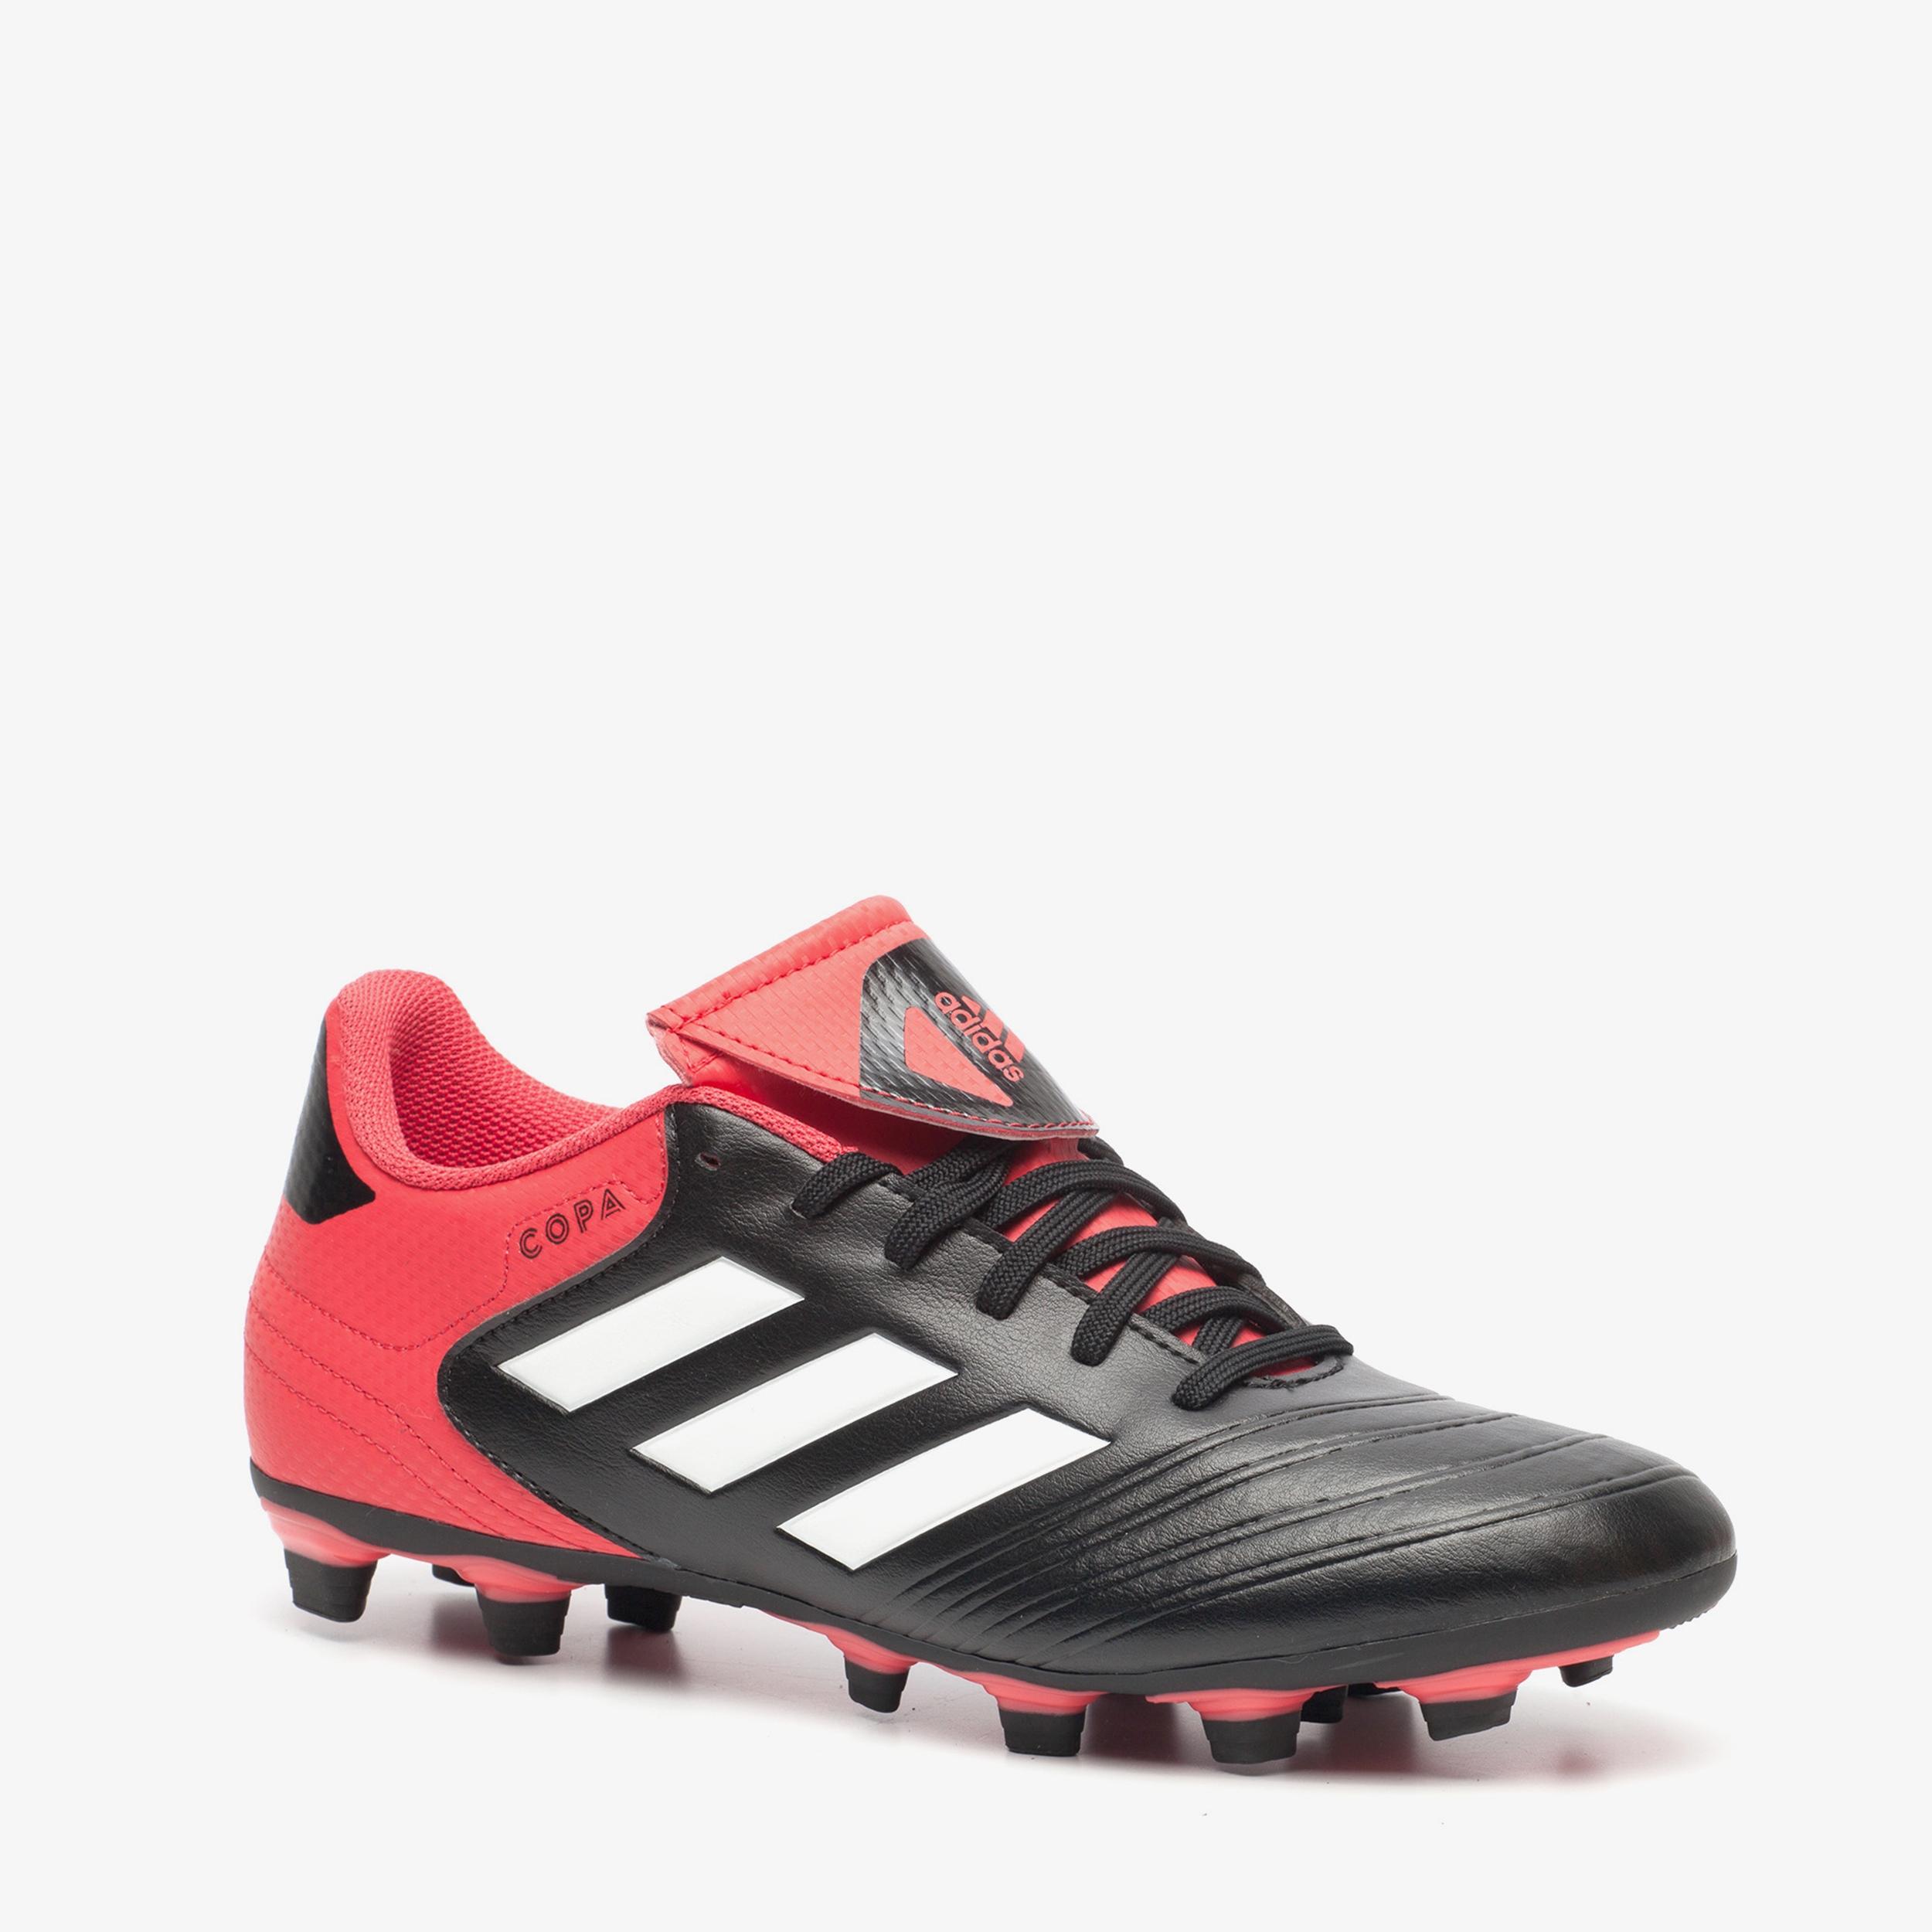 info for 55556 ab940 Adidas Copa 18.4 heren voetbalschoenen FxG